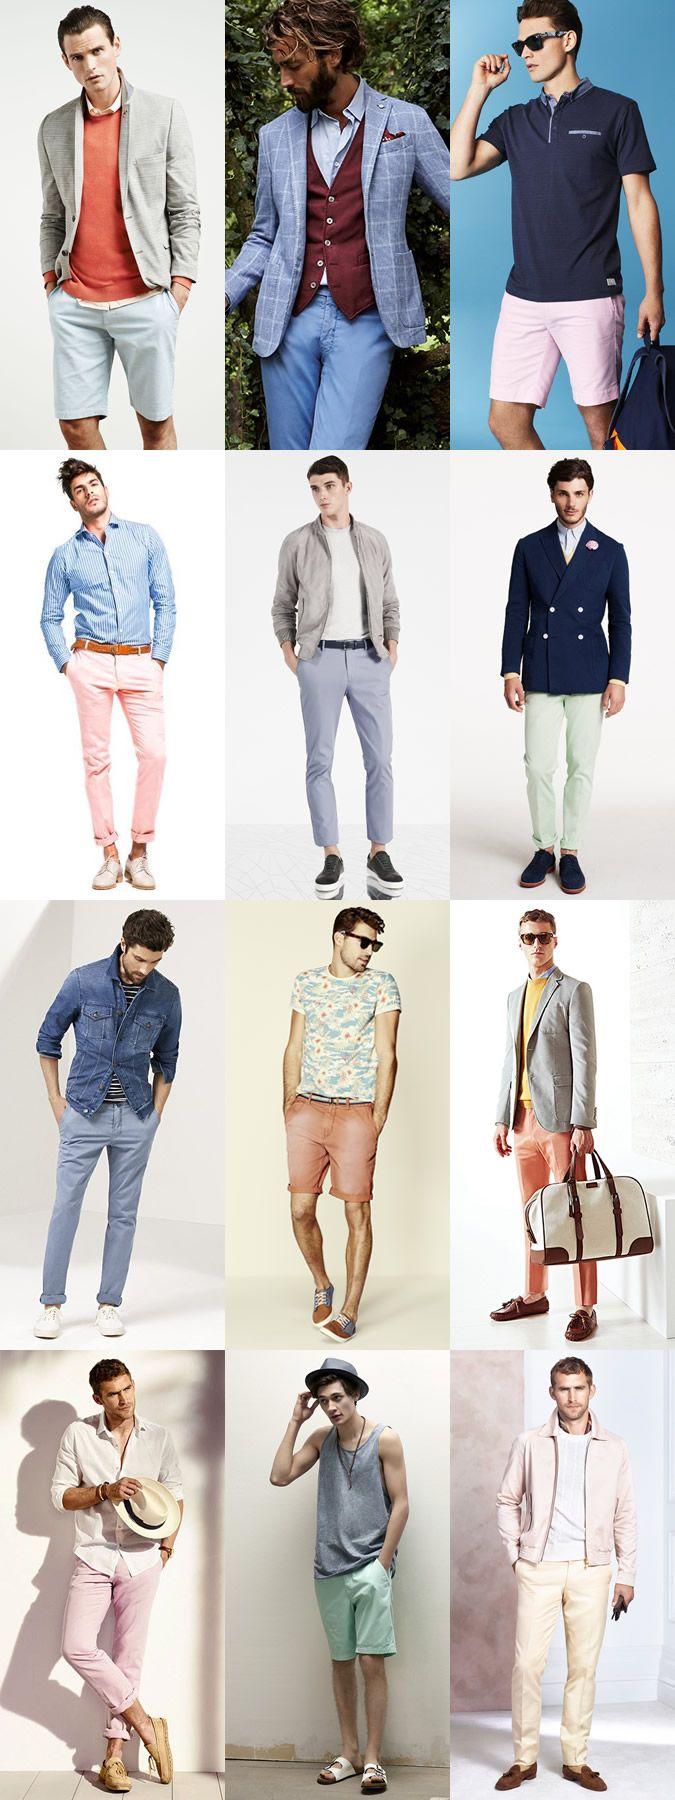 5 Key Menswear Pieces For Spring/Summer 2015 : 5. Pastel Legwear Lookbook Inspiration